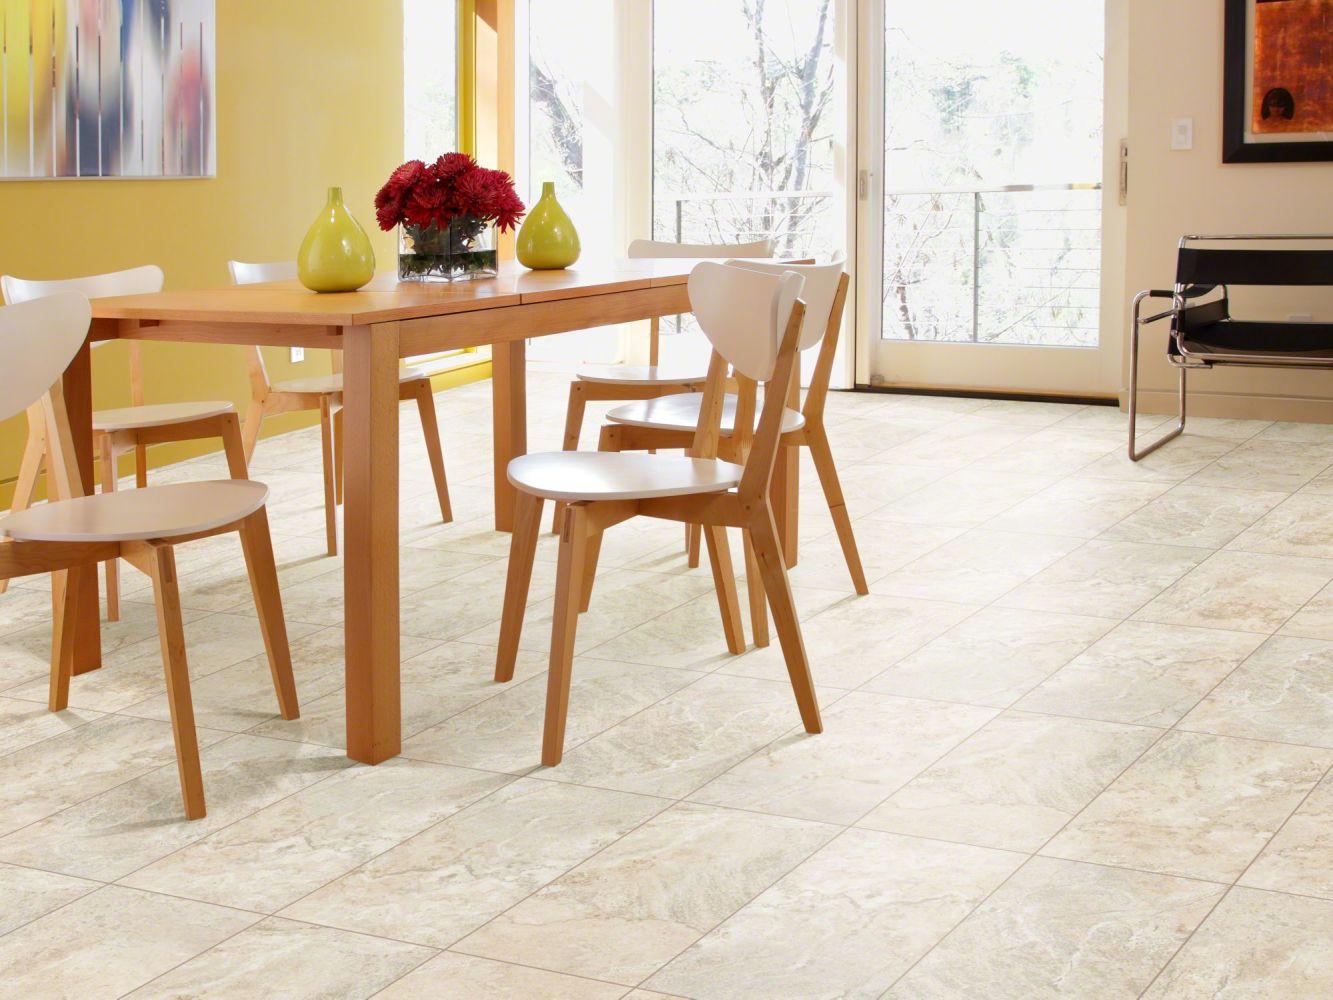 Shaw Floors Resilient Residential Fairmount Ti 20 Centennial 00272_0414V